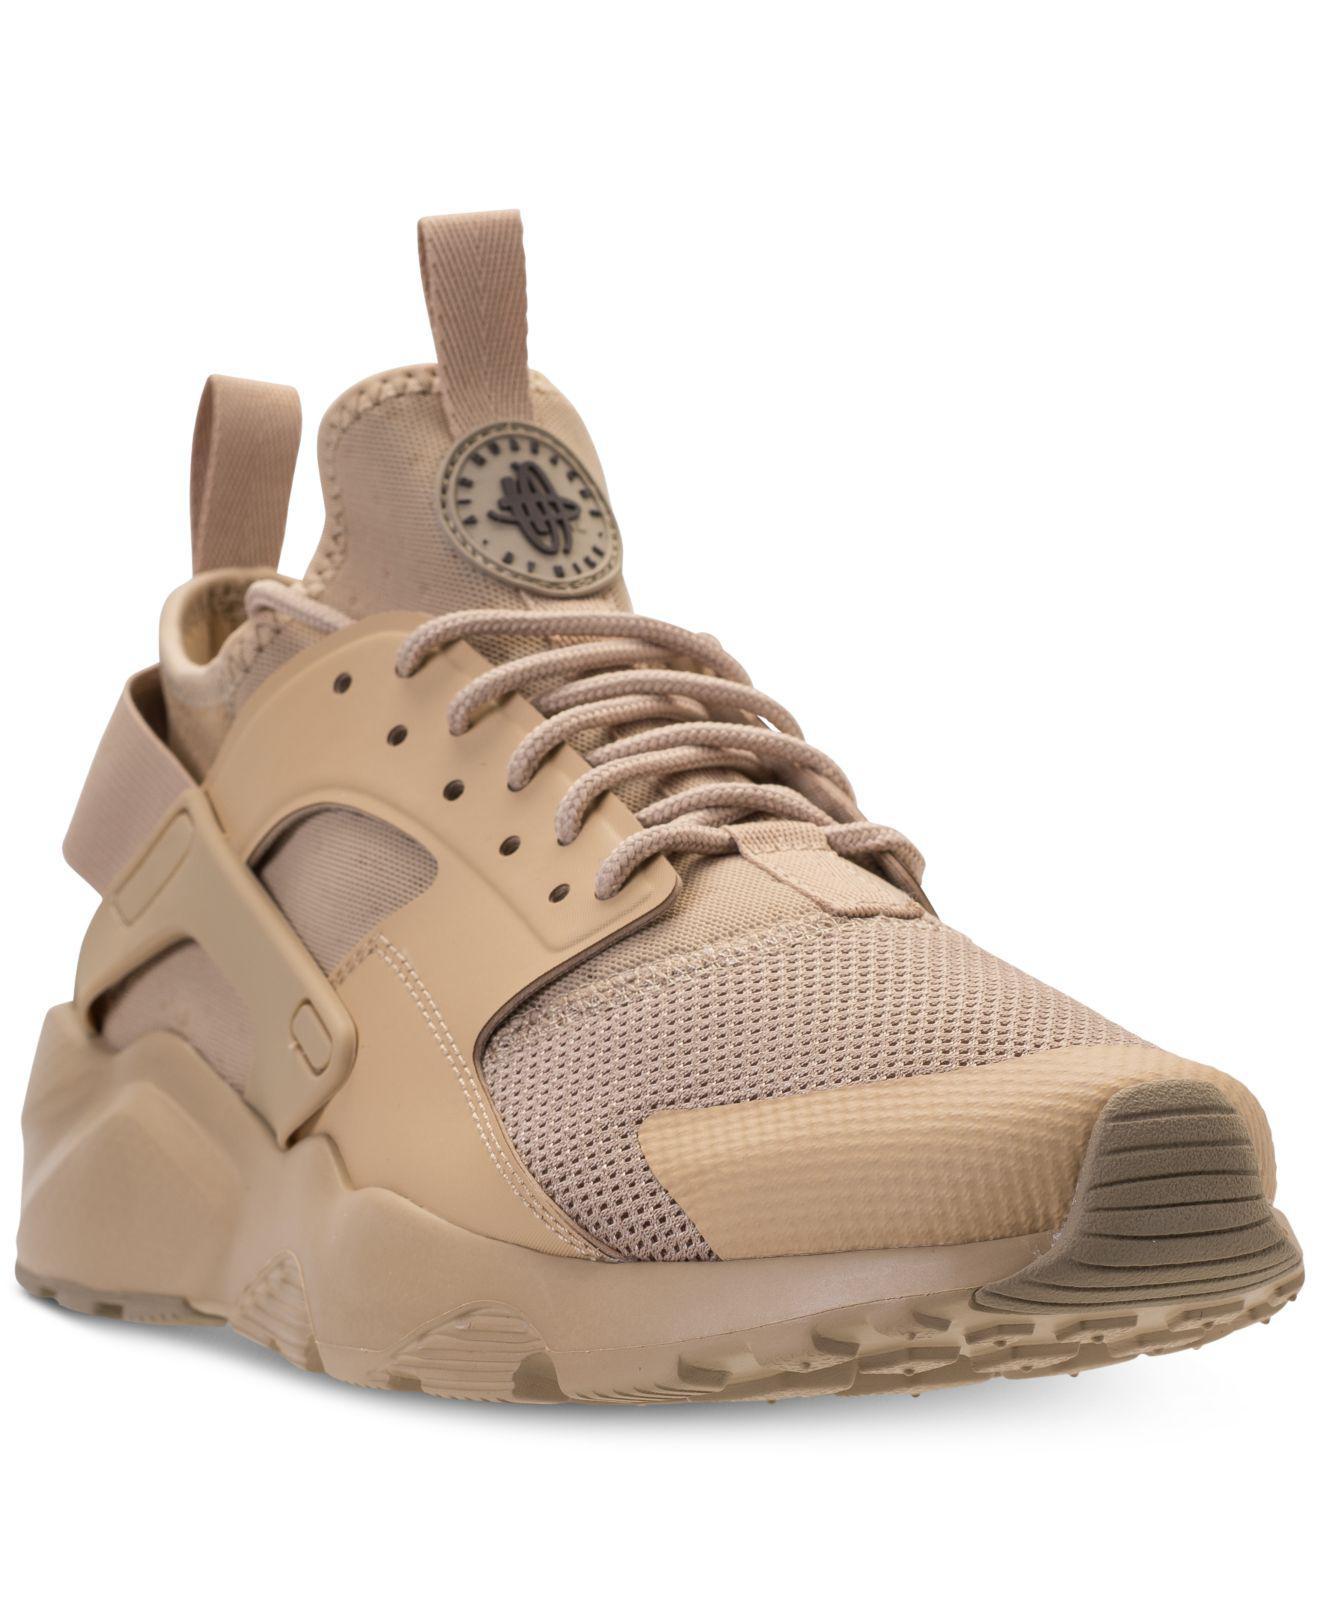 lyst nike air huarache uomini correre ultra le scarpe casual